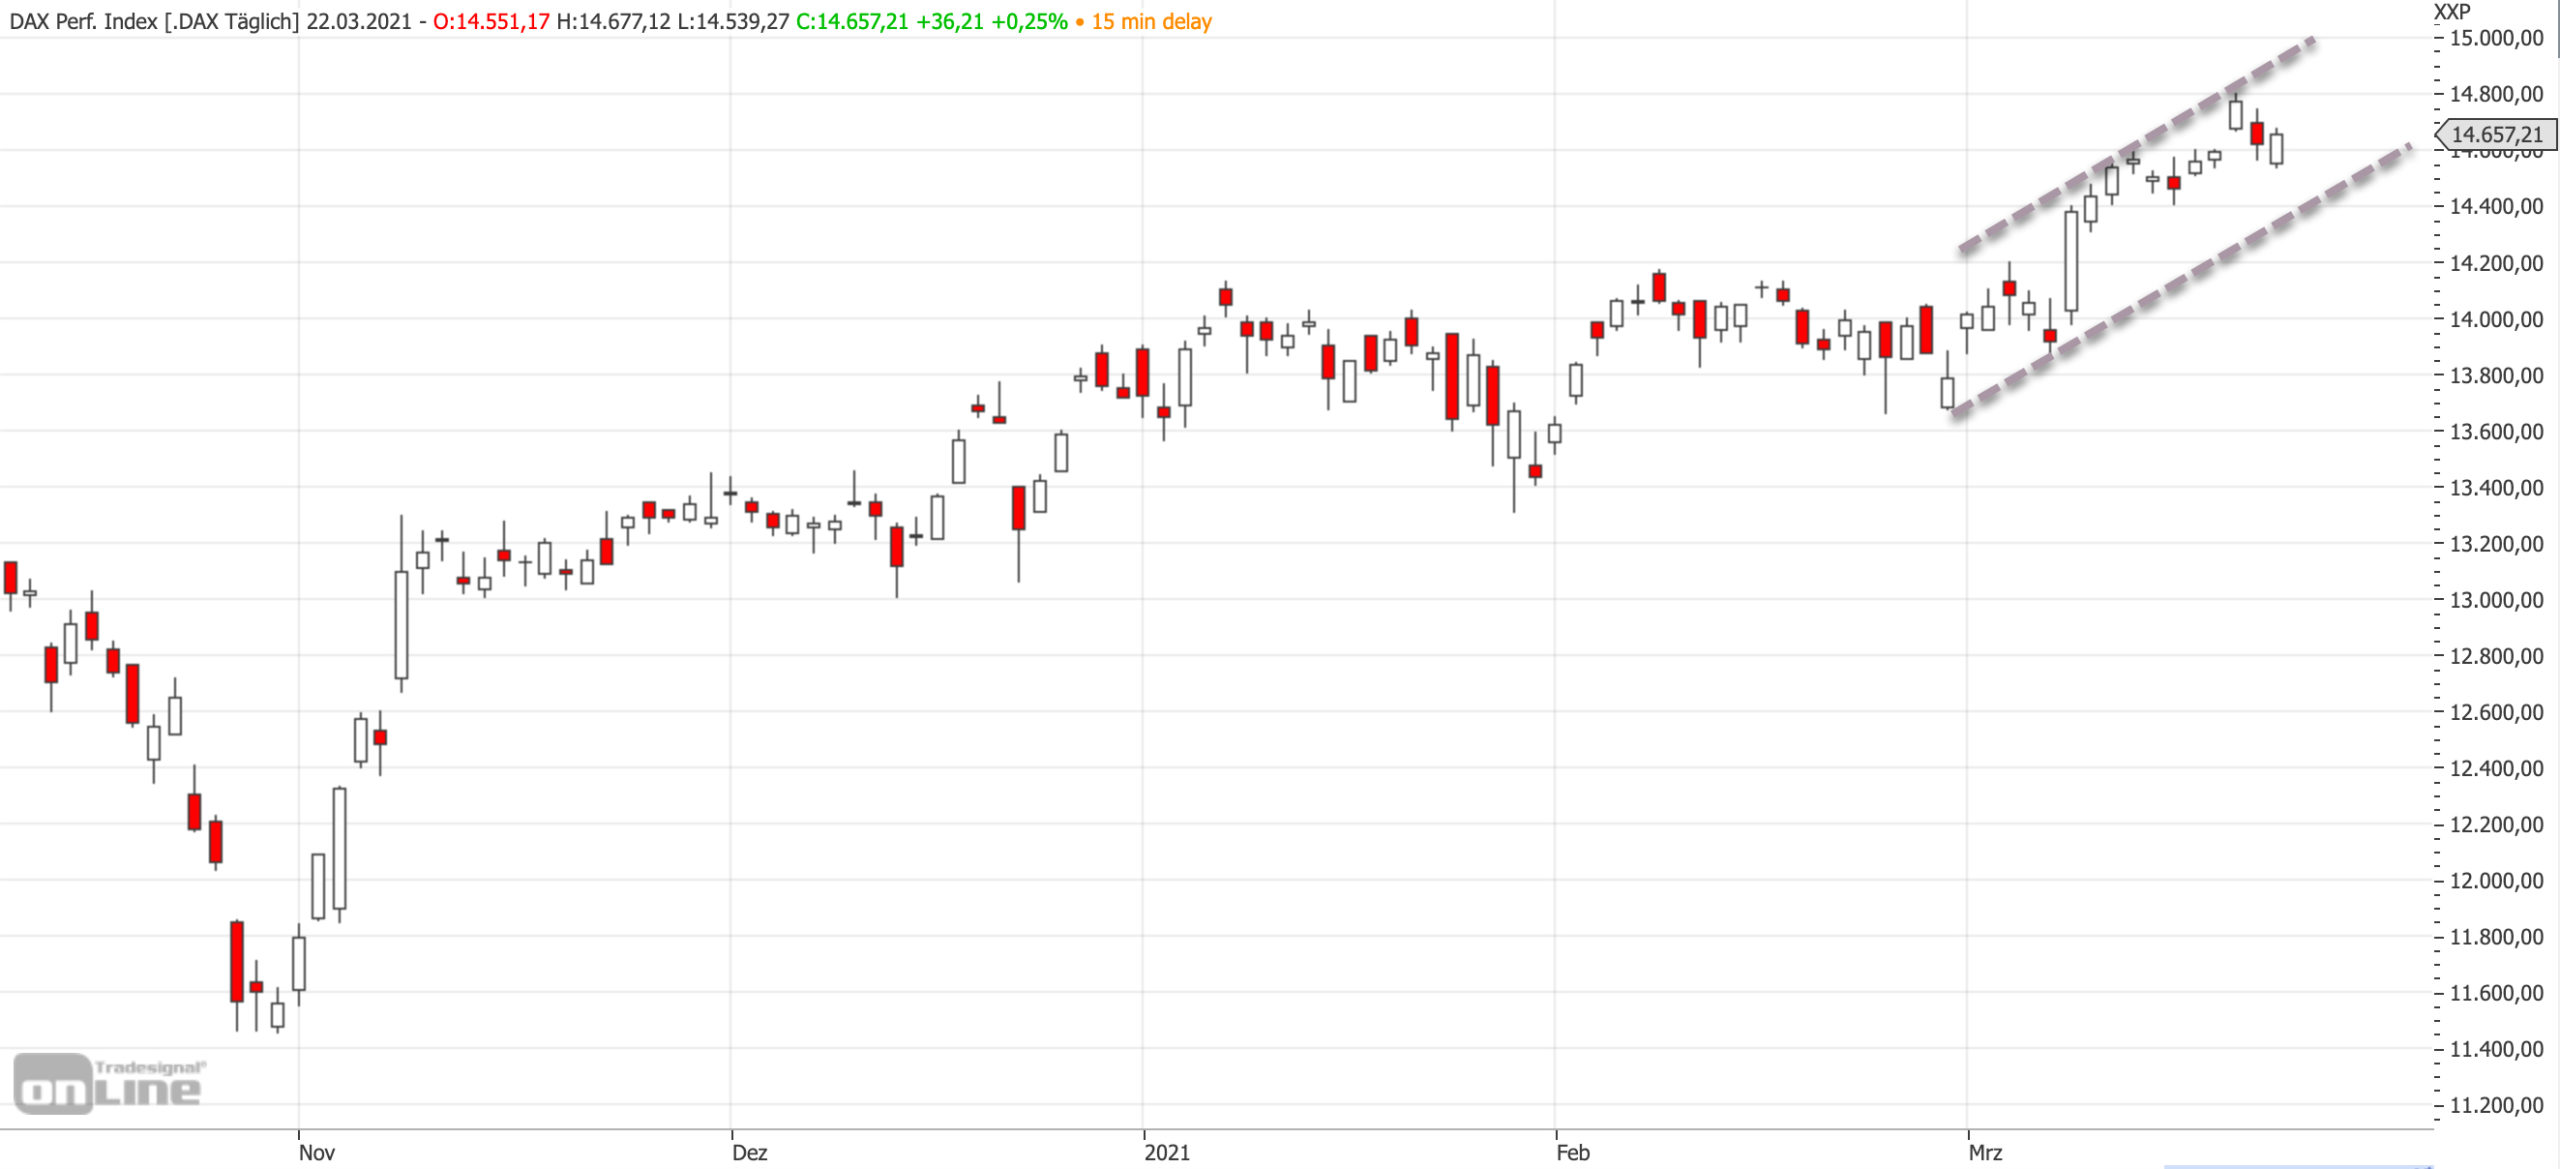 Mittelfristiger DAX-Chart am 22.03.2021